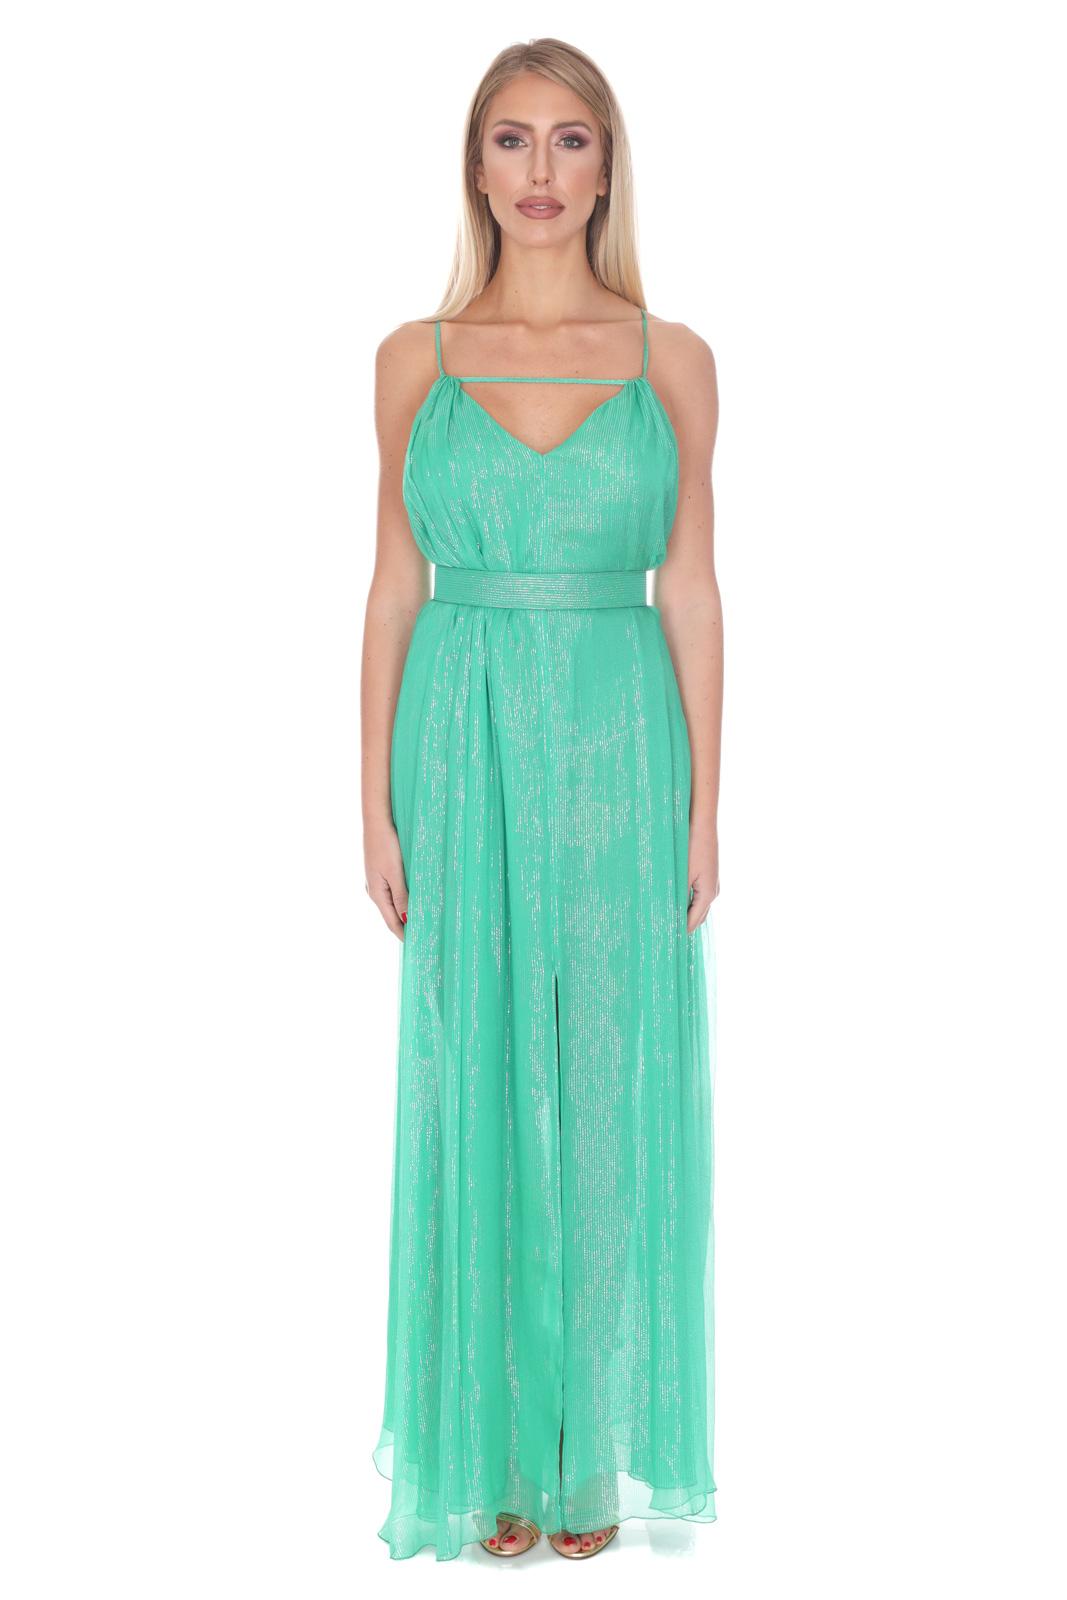 SIMONA CORSELLINI | Dress | P20CMAB0700420